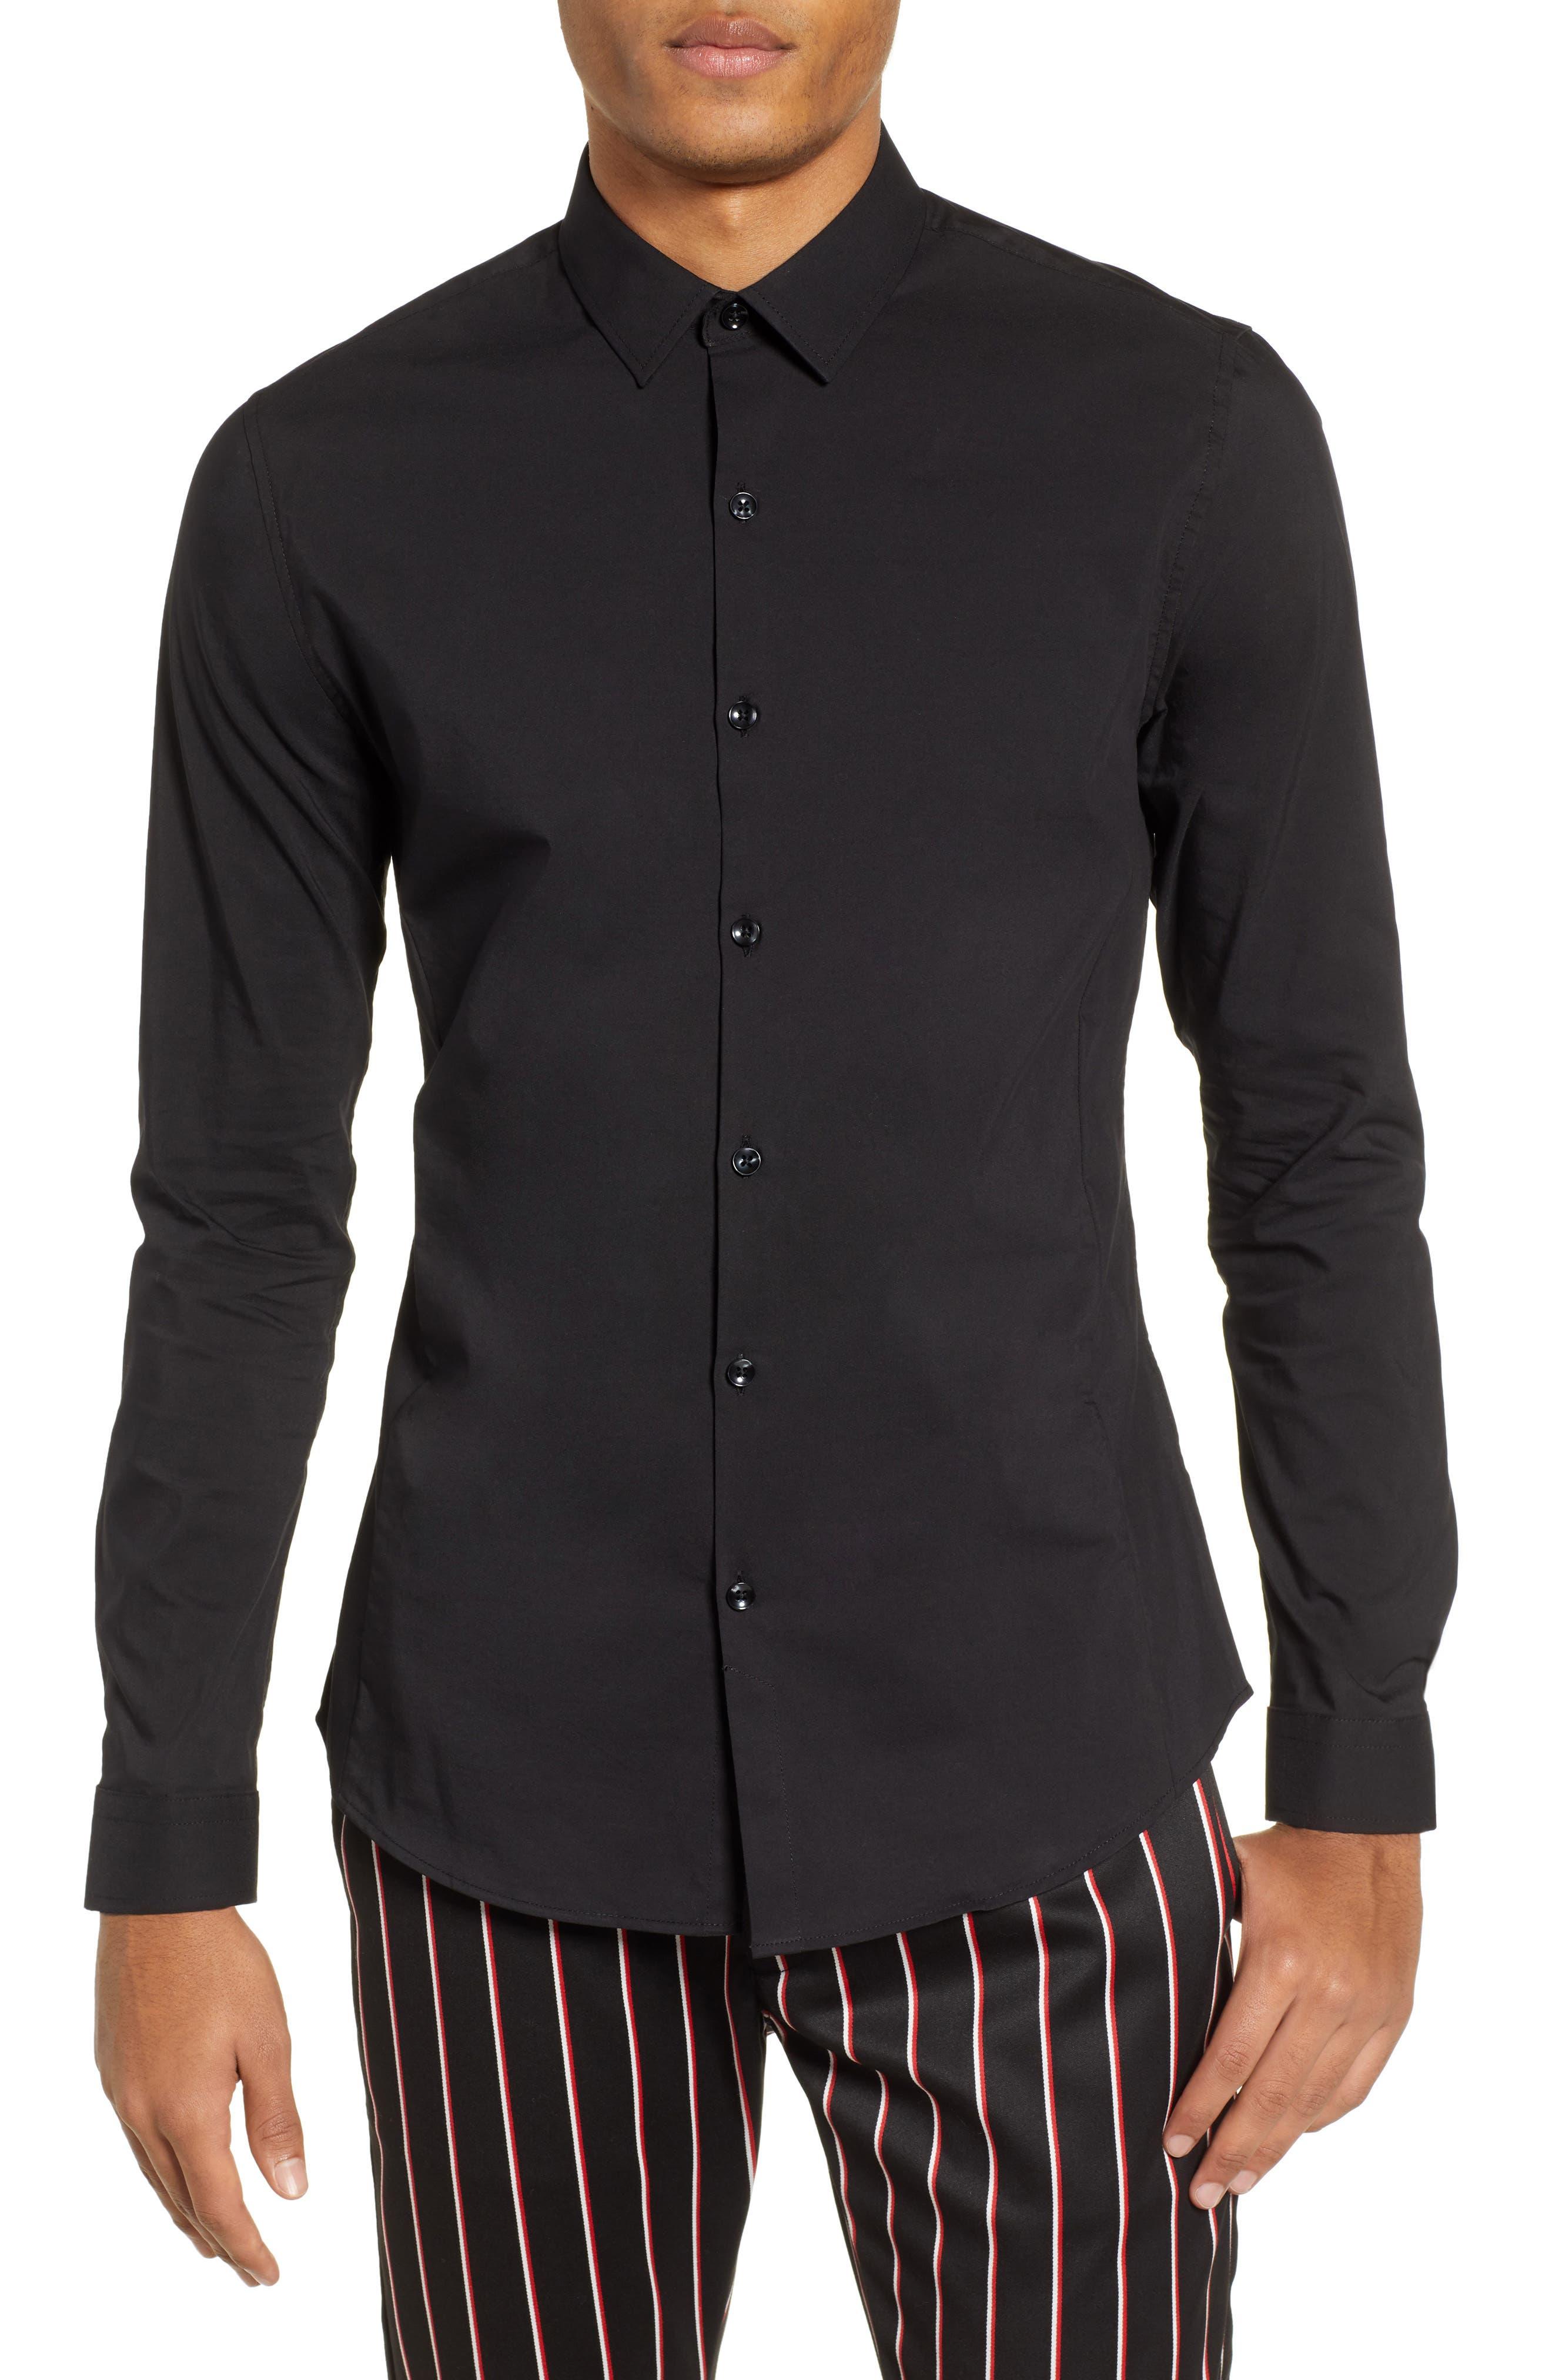 Topman Stretch Woven Shirt, Black